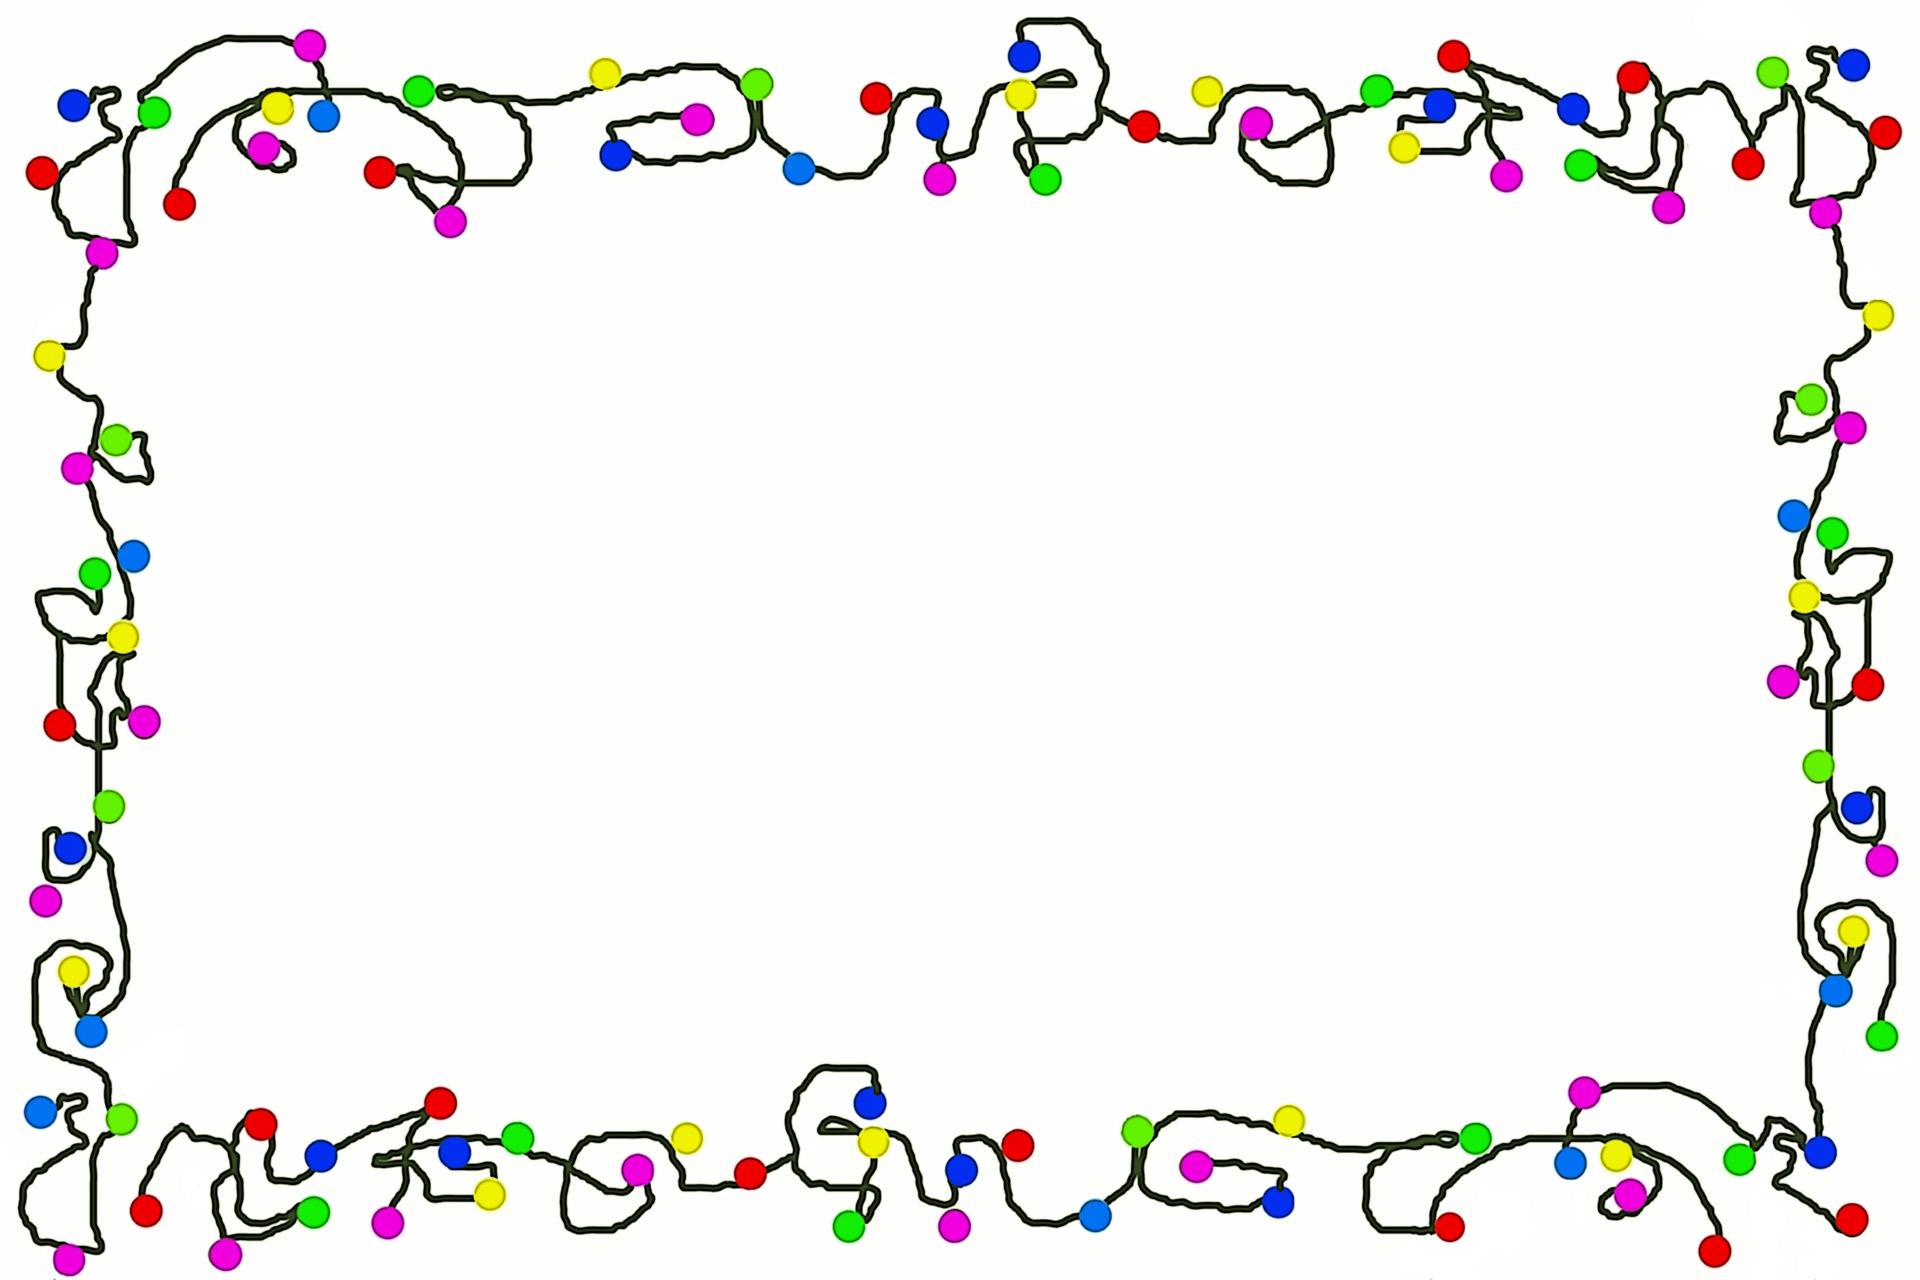 Bells Garland Christmas Lights Border Clipart - Clipart Kid